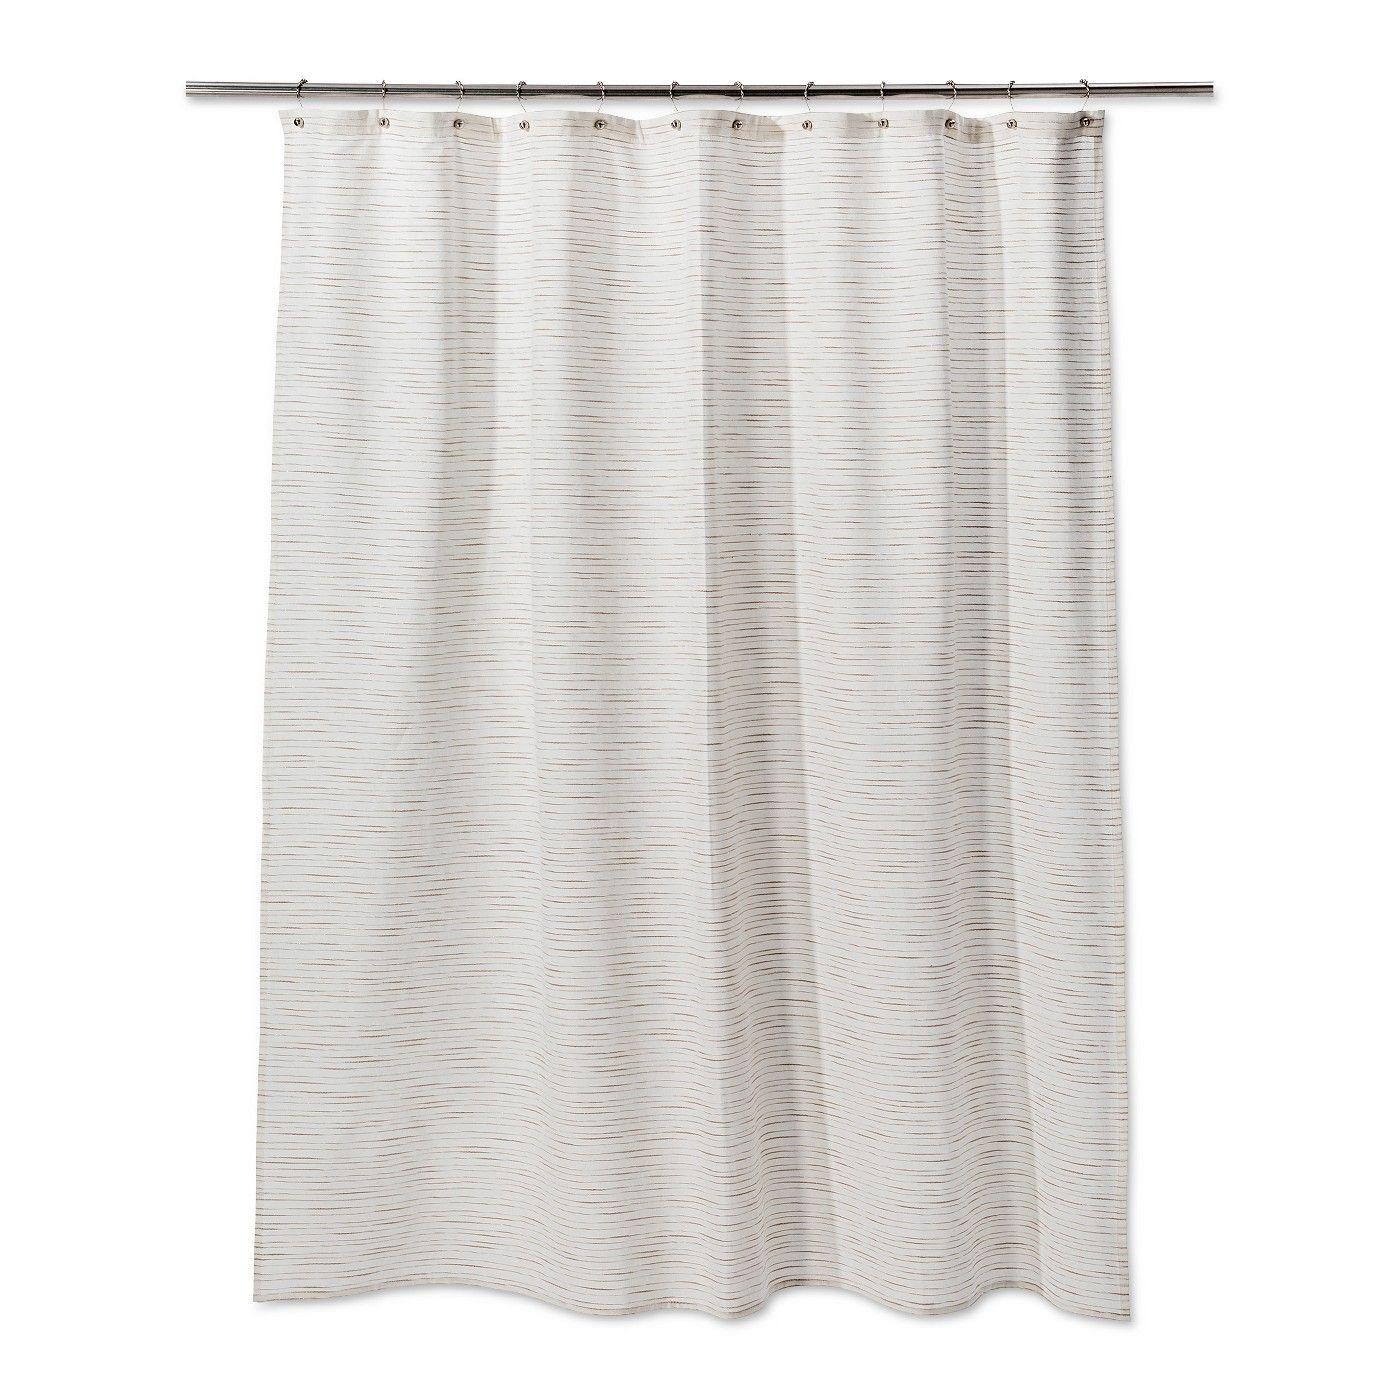 Woven Metallic Slub Shower Curtain Sour Cream Project 62